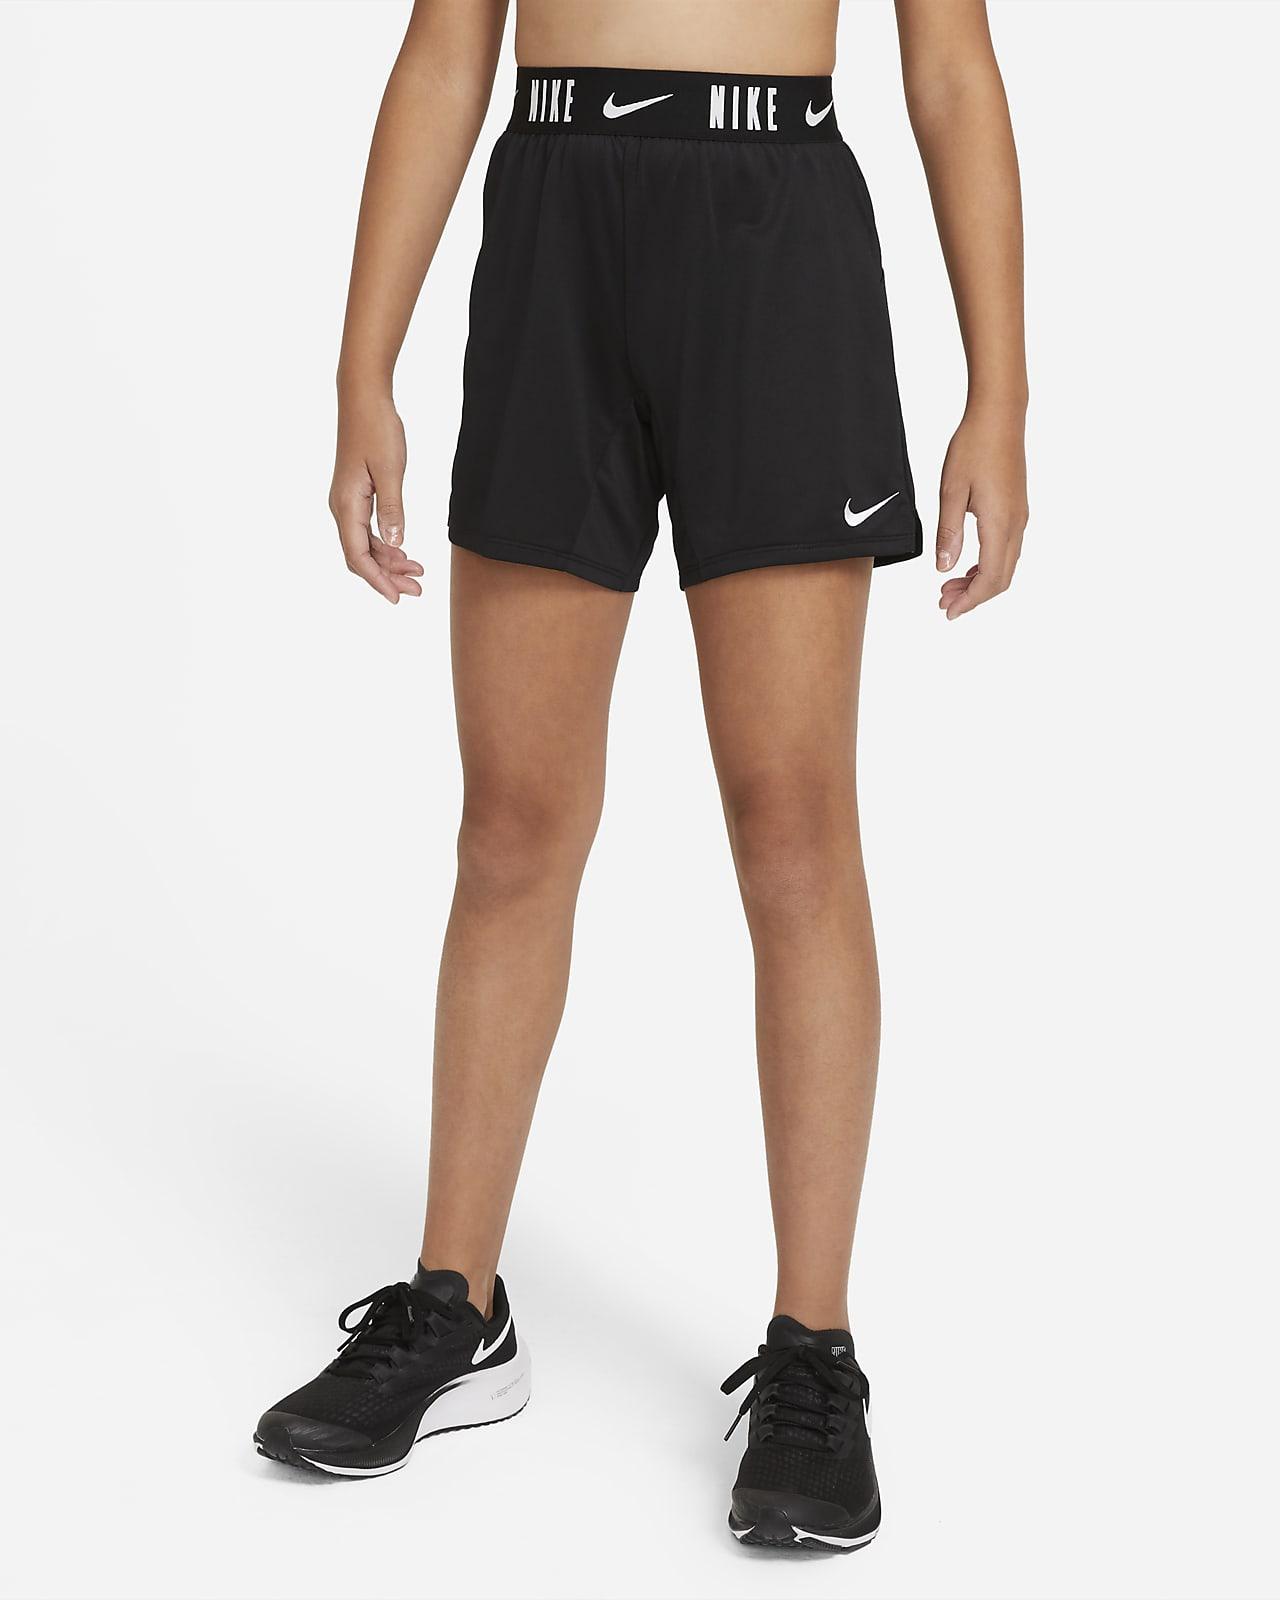 Nike Dri-FIT Trophy Older Kids' (Girls') 15cm (approx.) Training Shorts